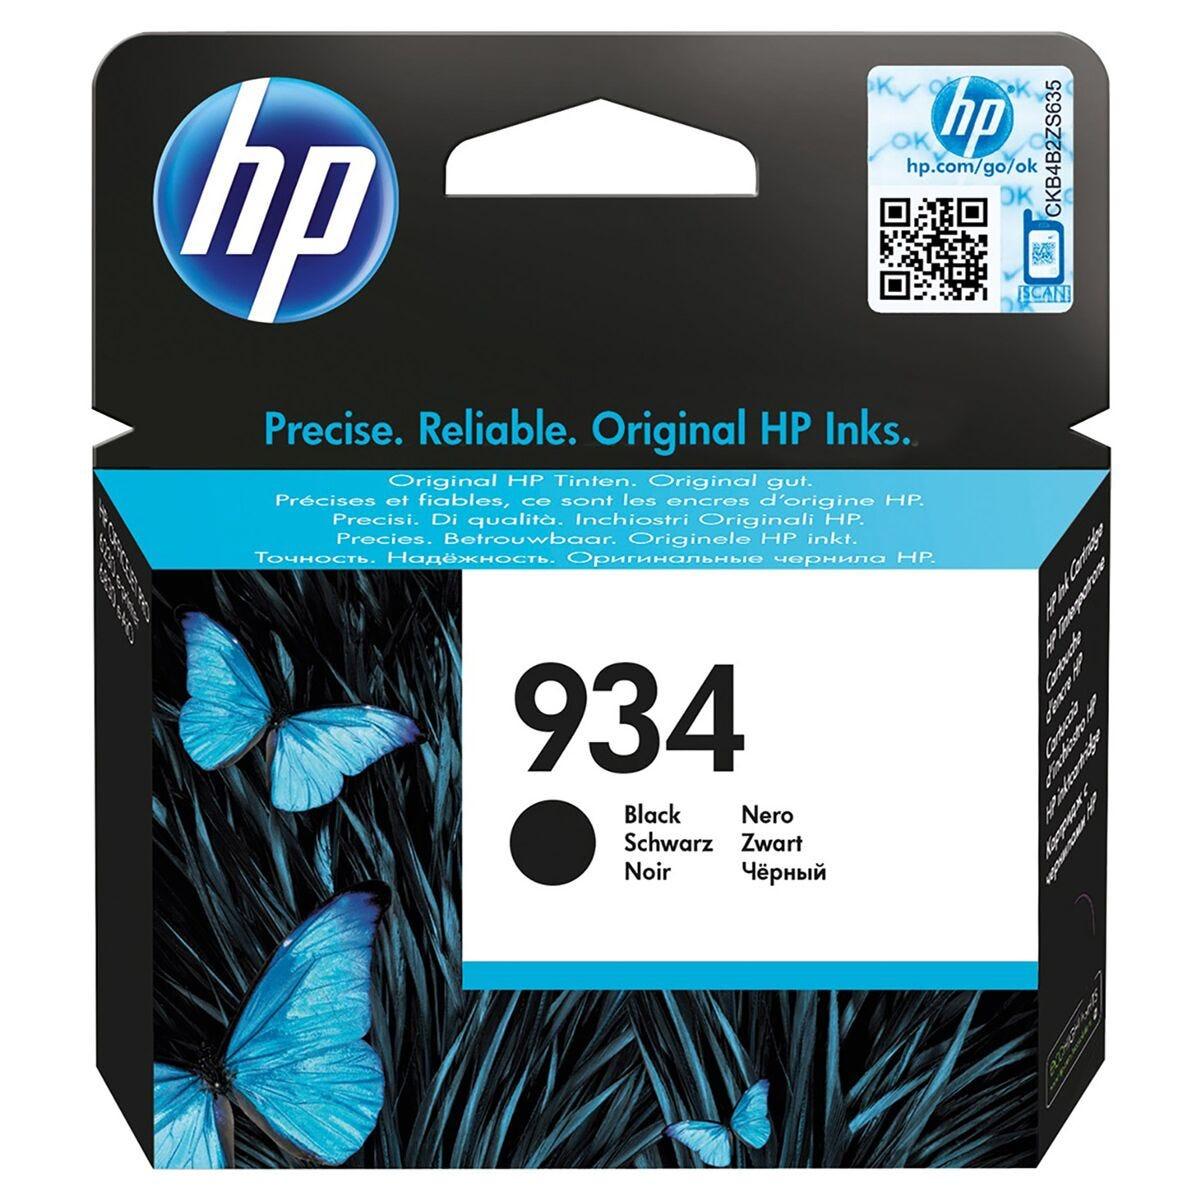 HP 934 Ink Cartridge